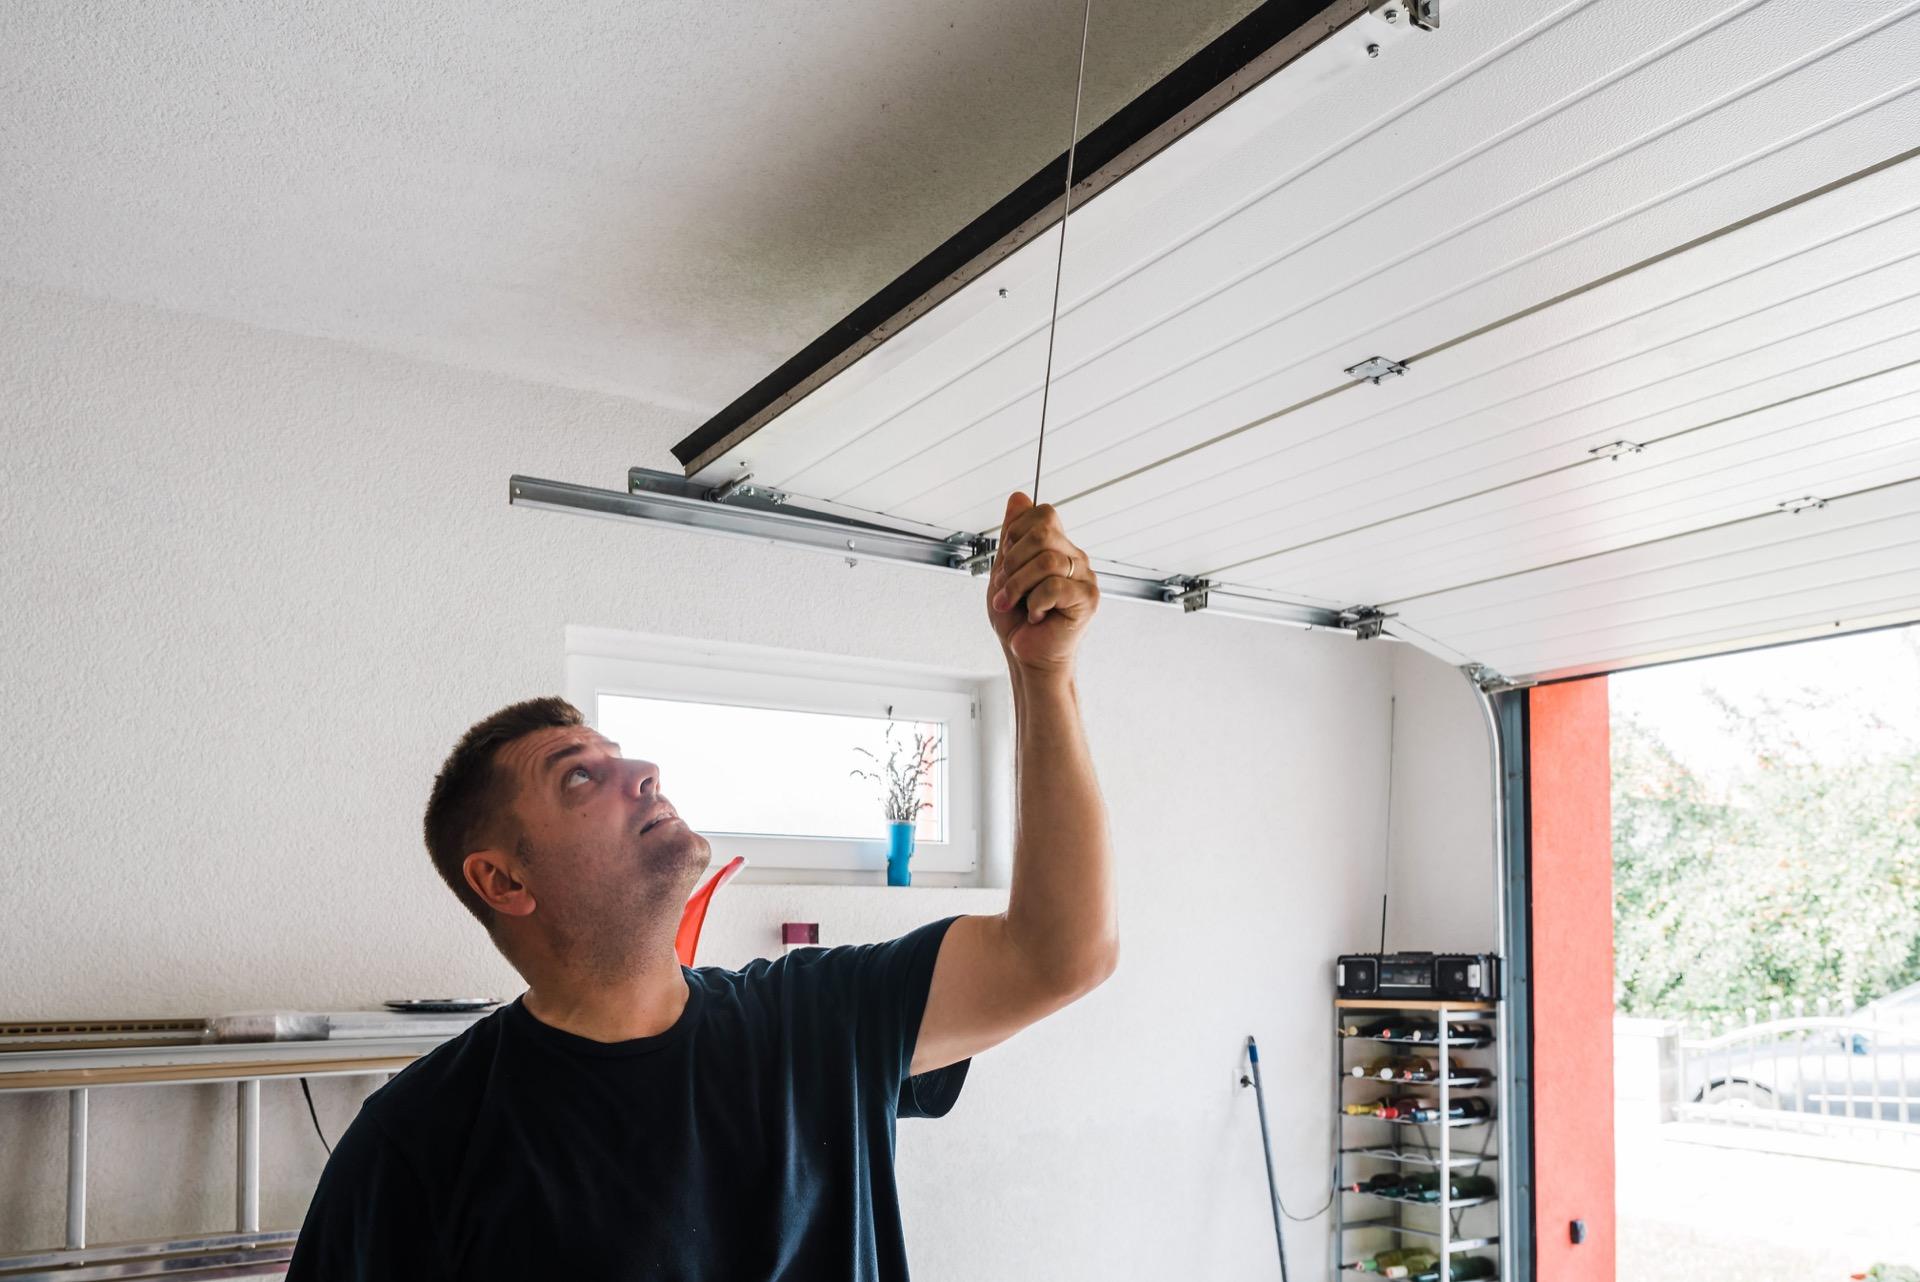 Man opening manual garage door from inside garage